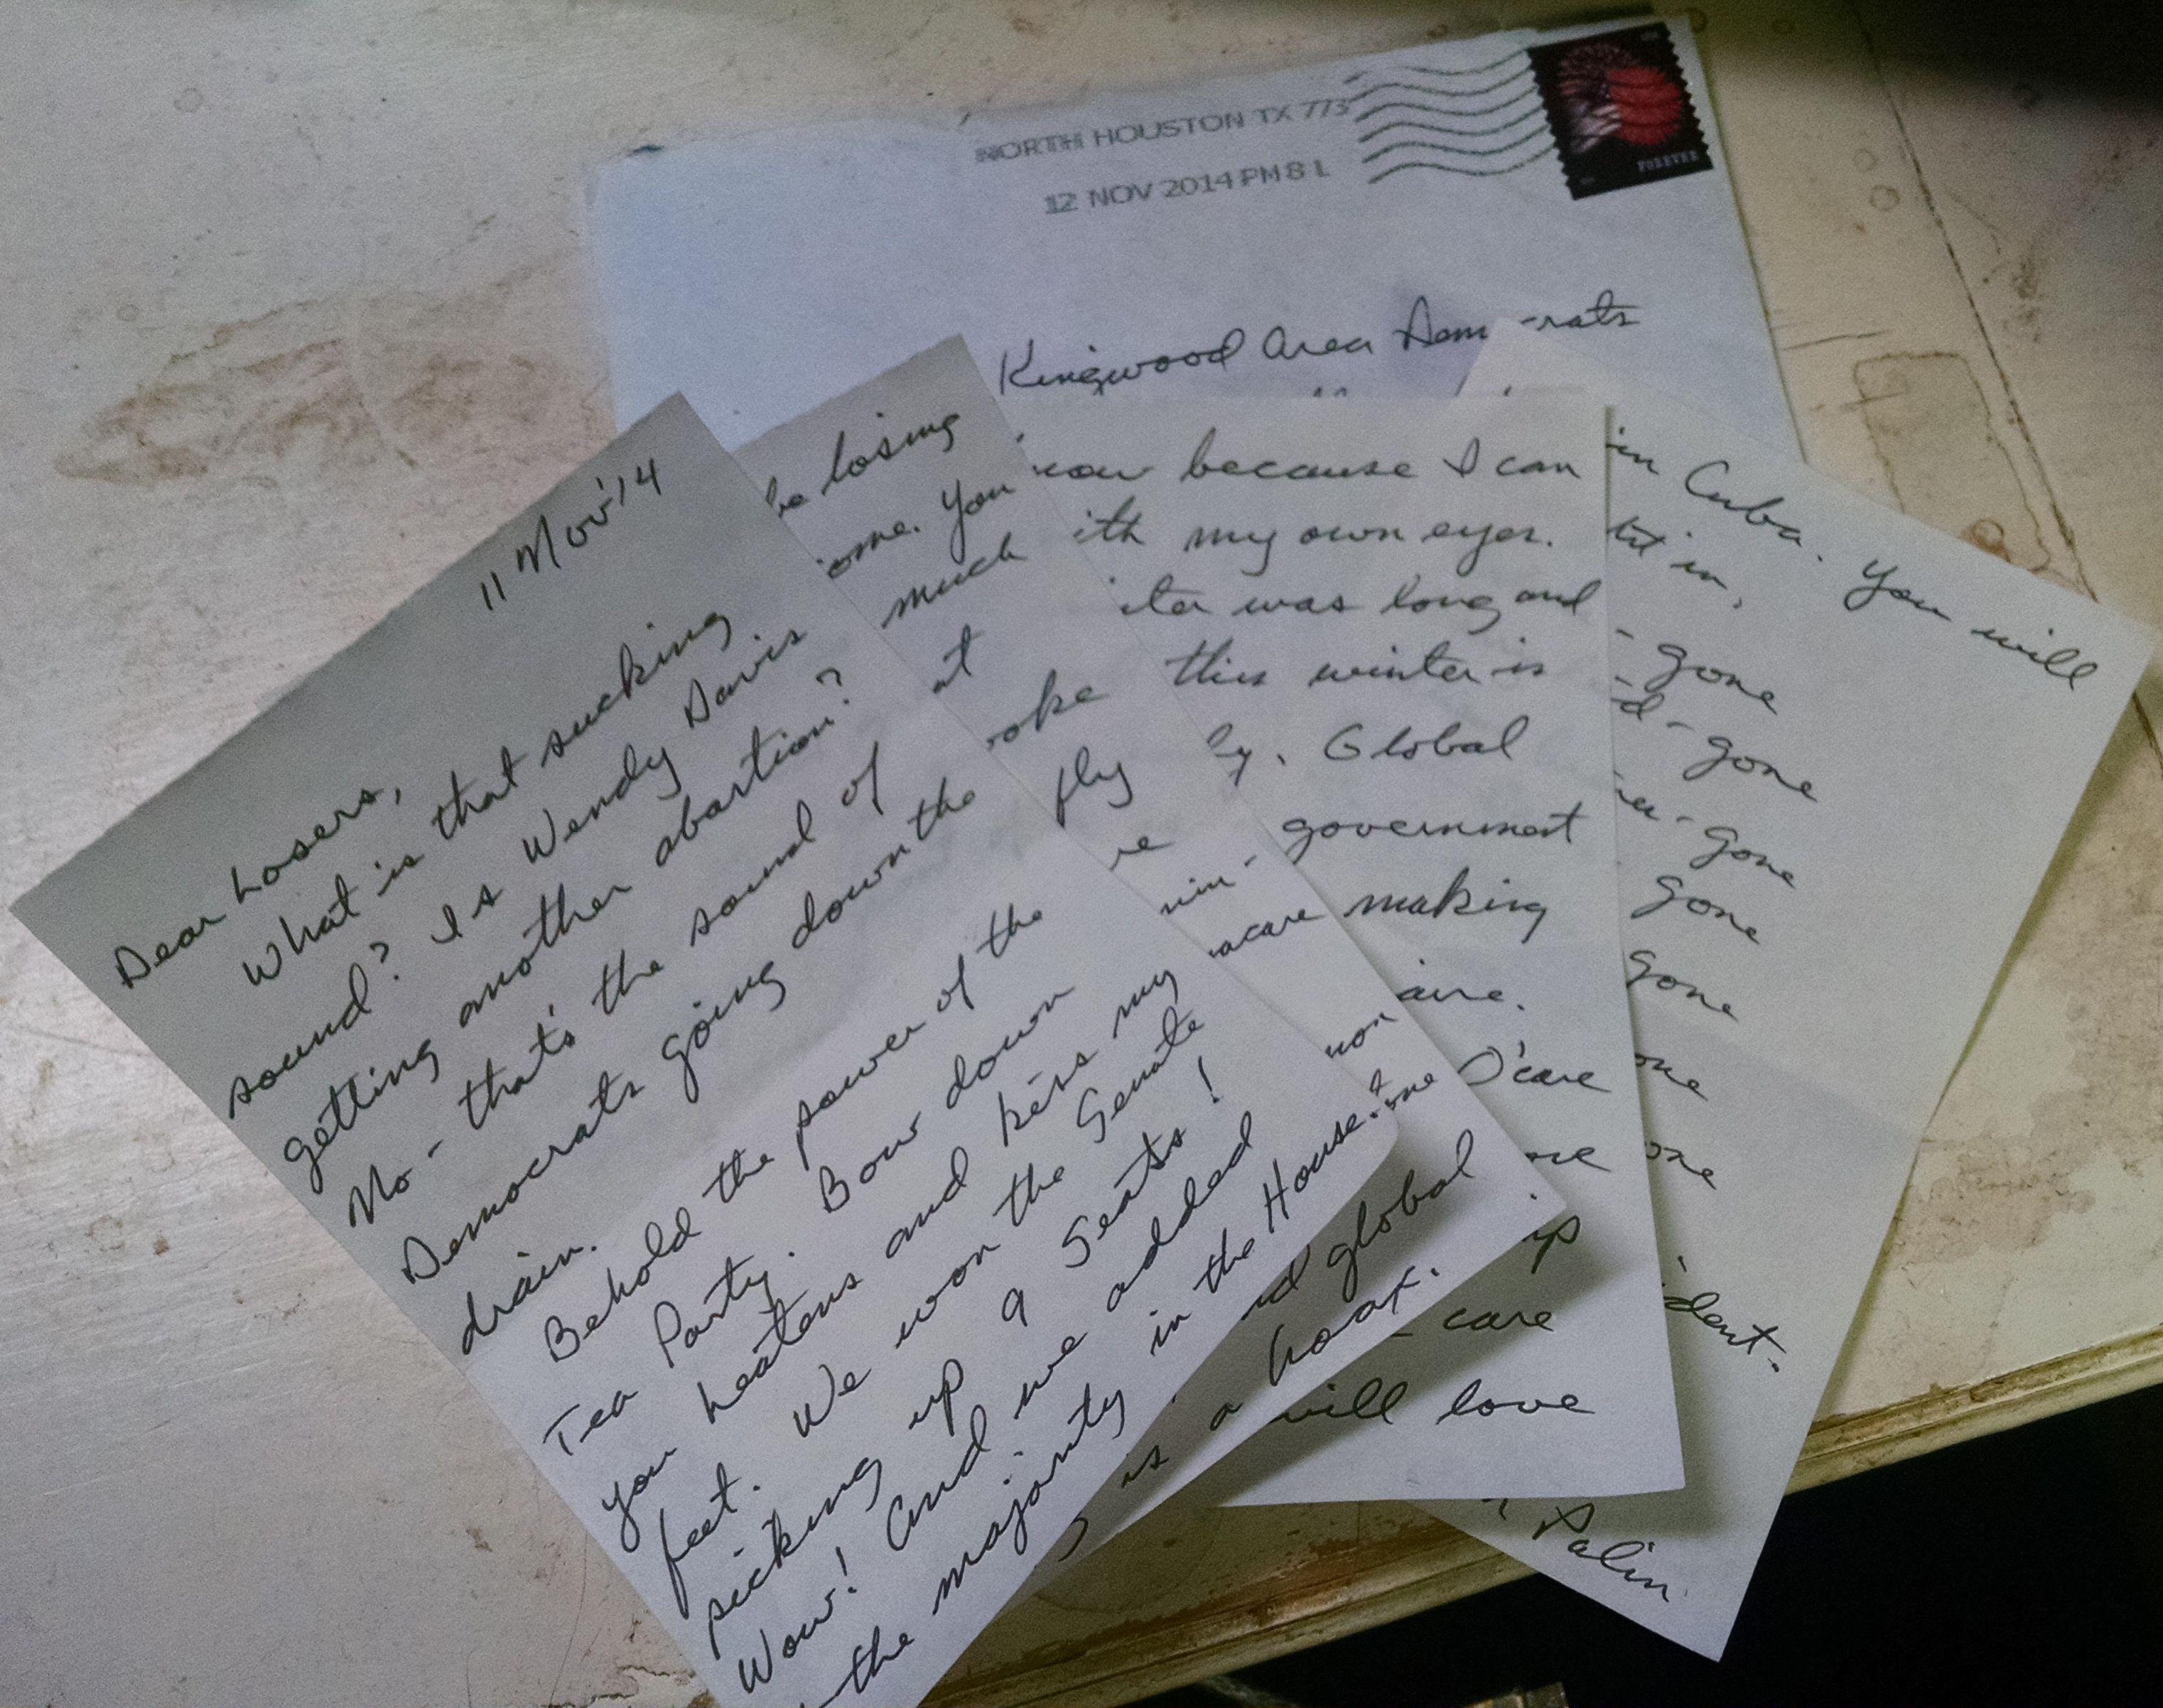 hate mail from Sarah Palin KAD Kingwood Area Democrats